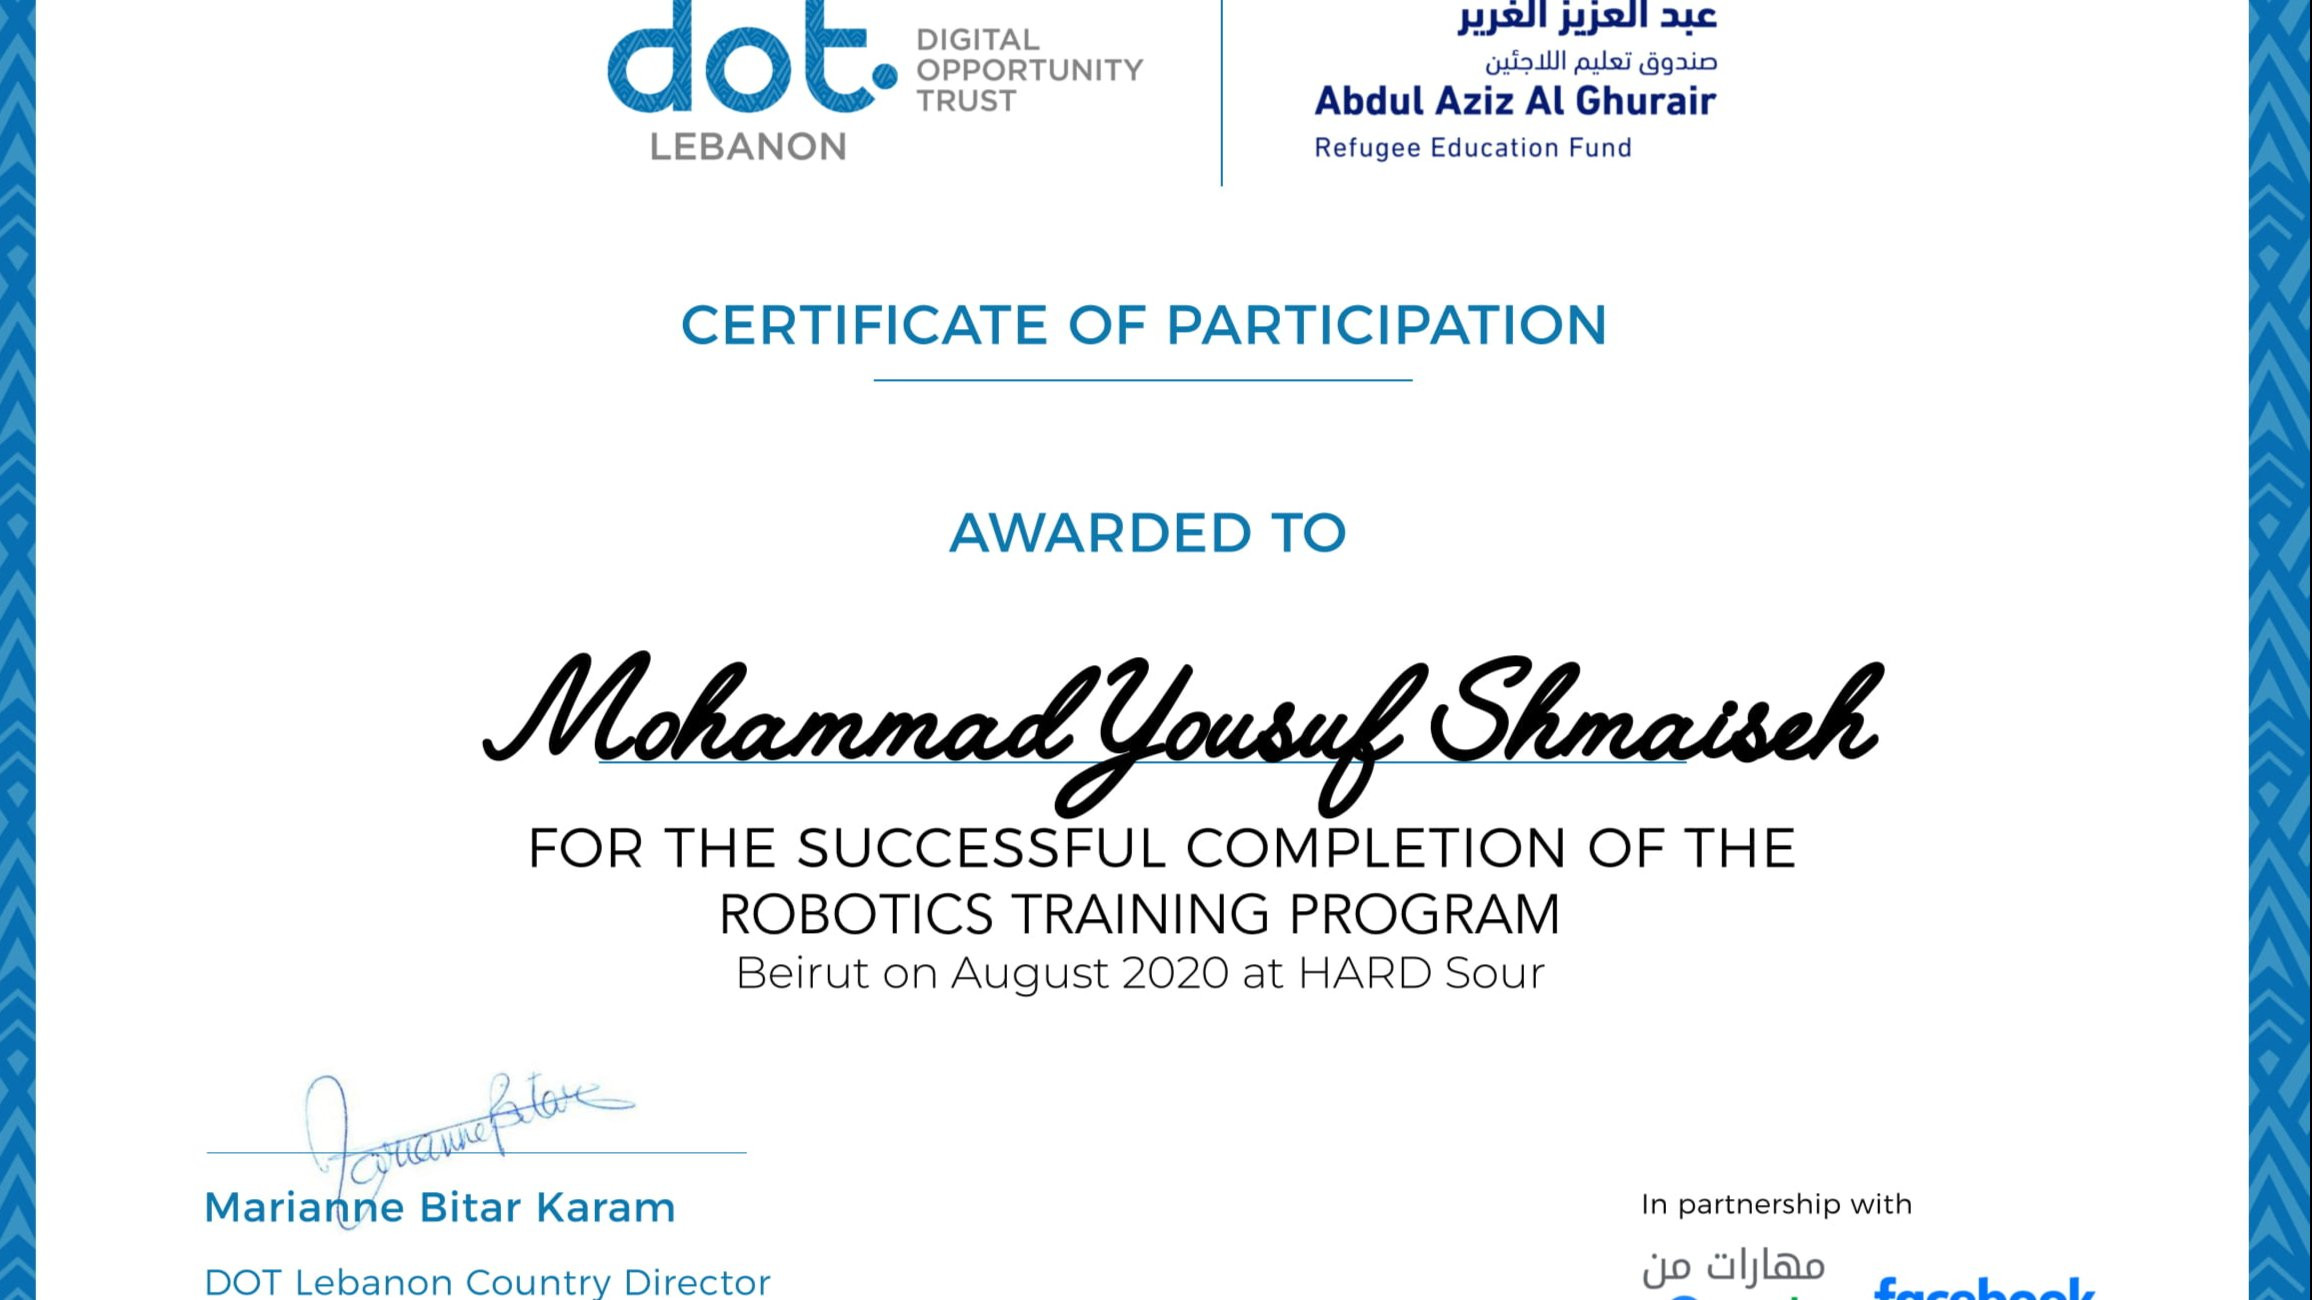 Robotics Training Program Certification